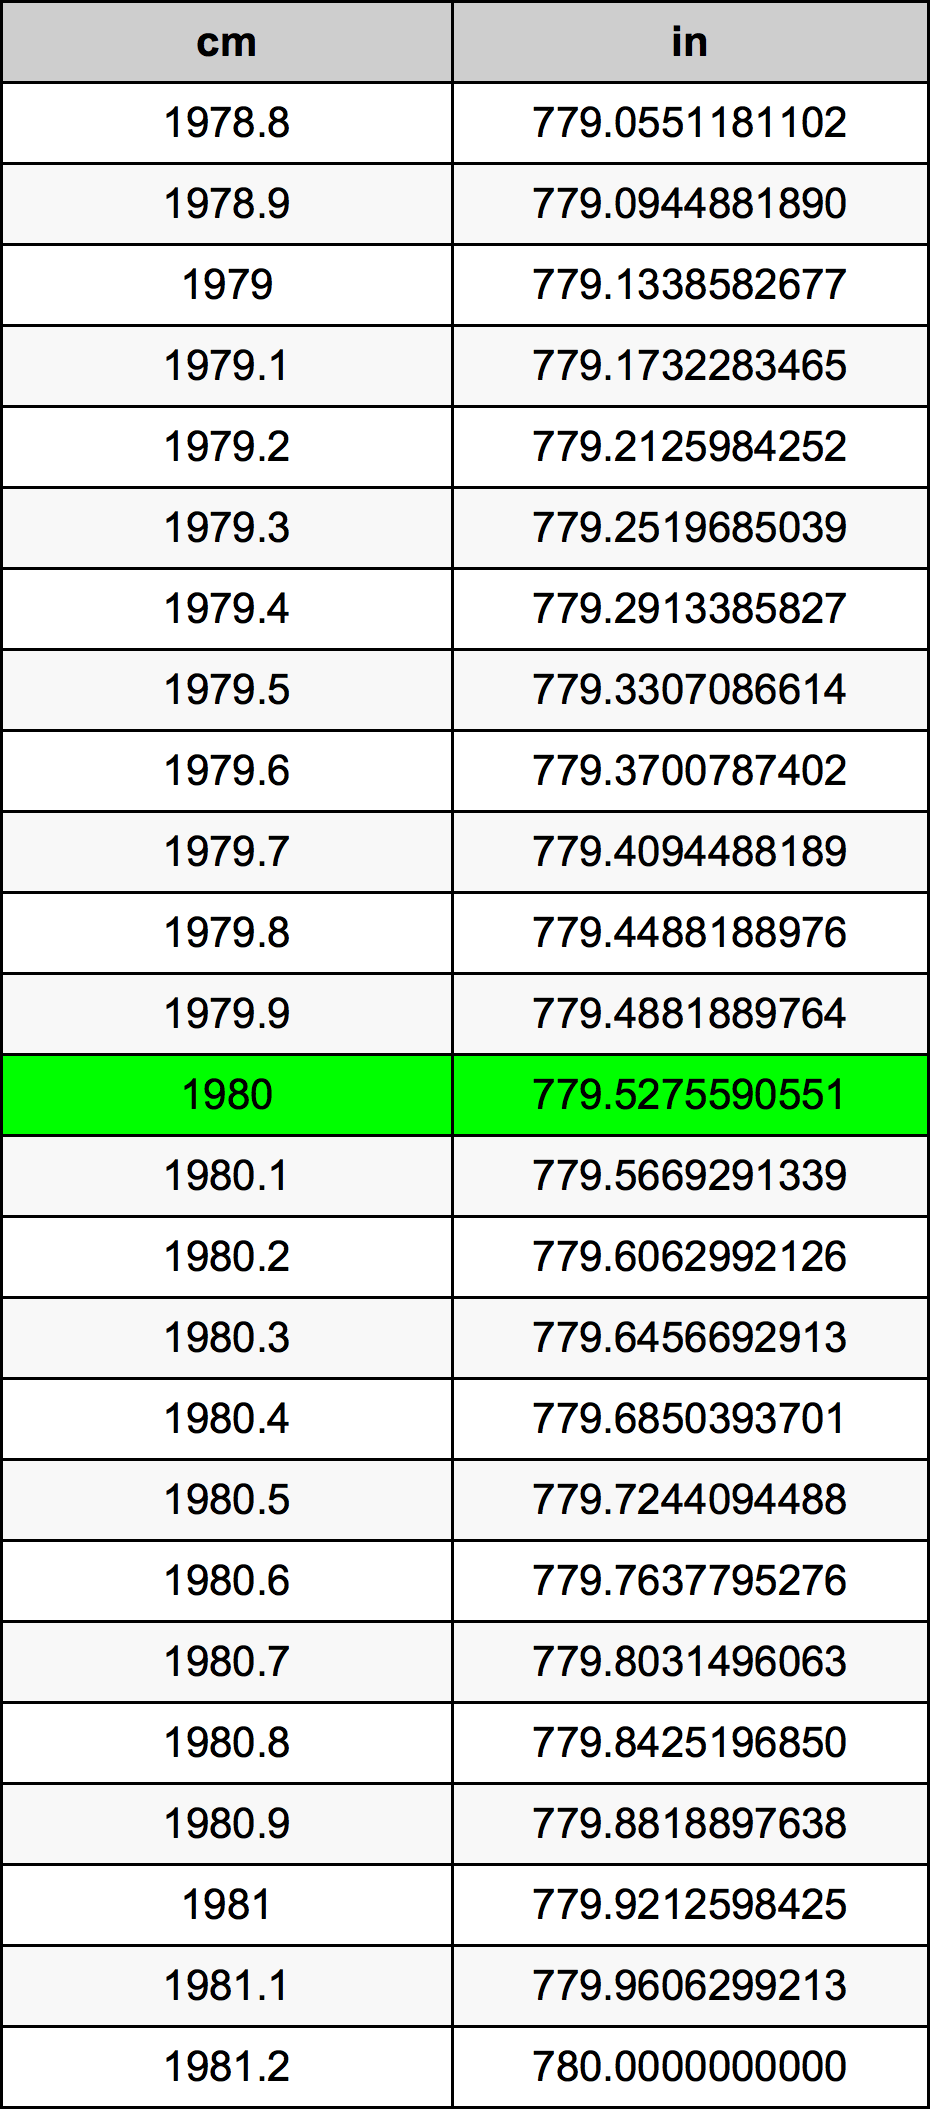 1980 Centimeter pretvorbena tabela